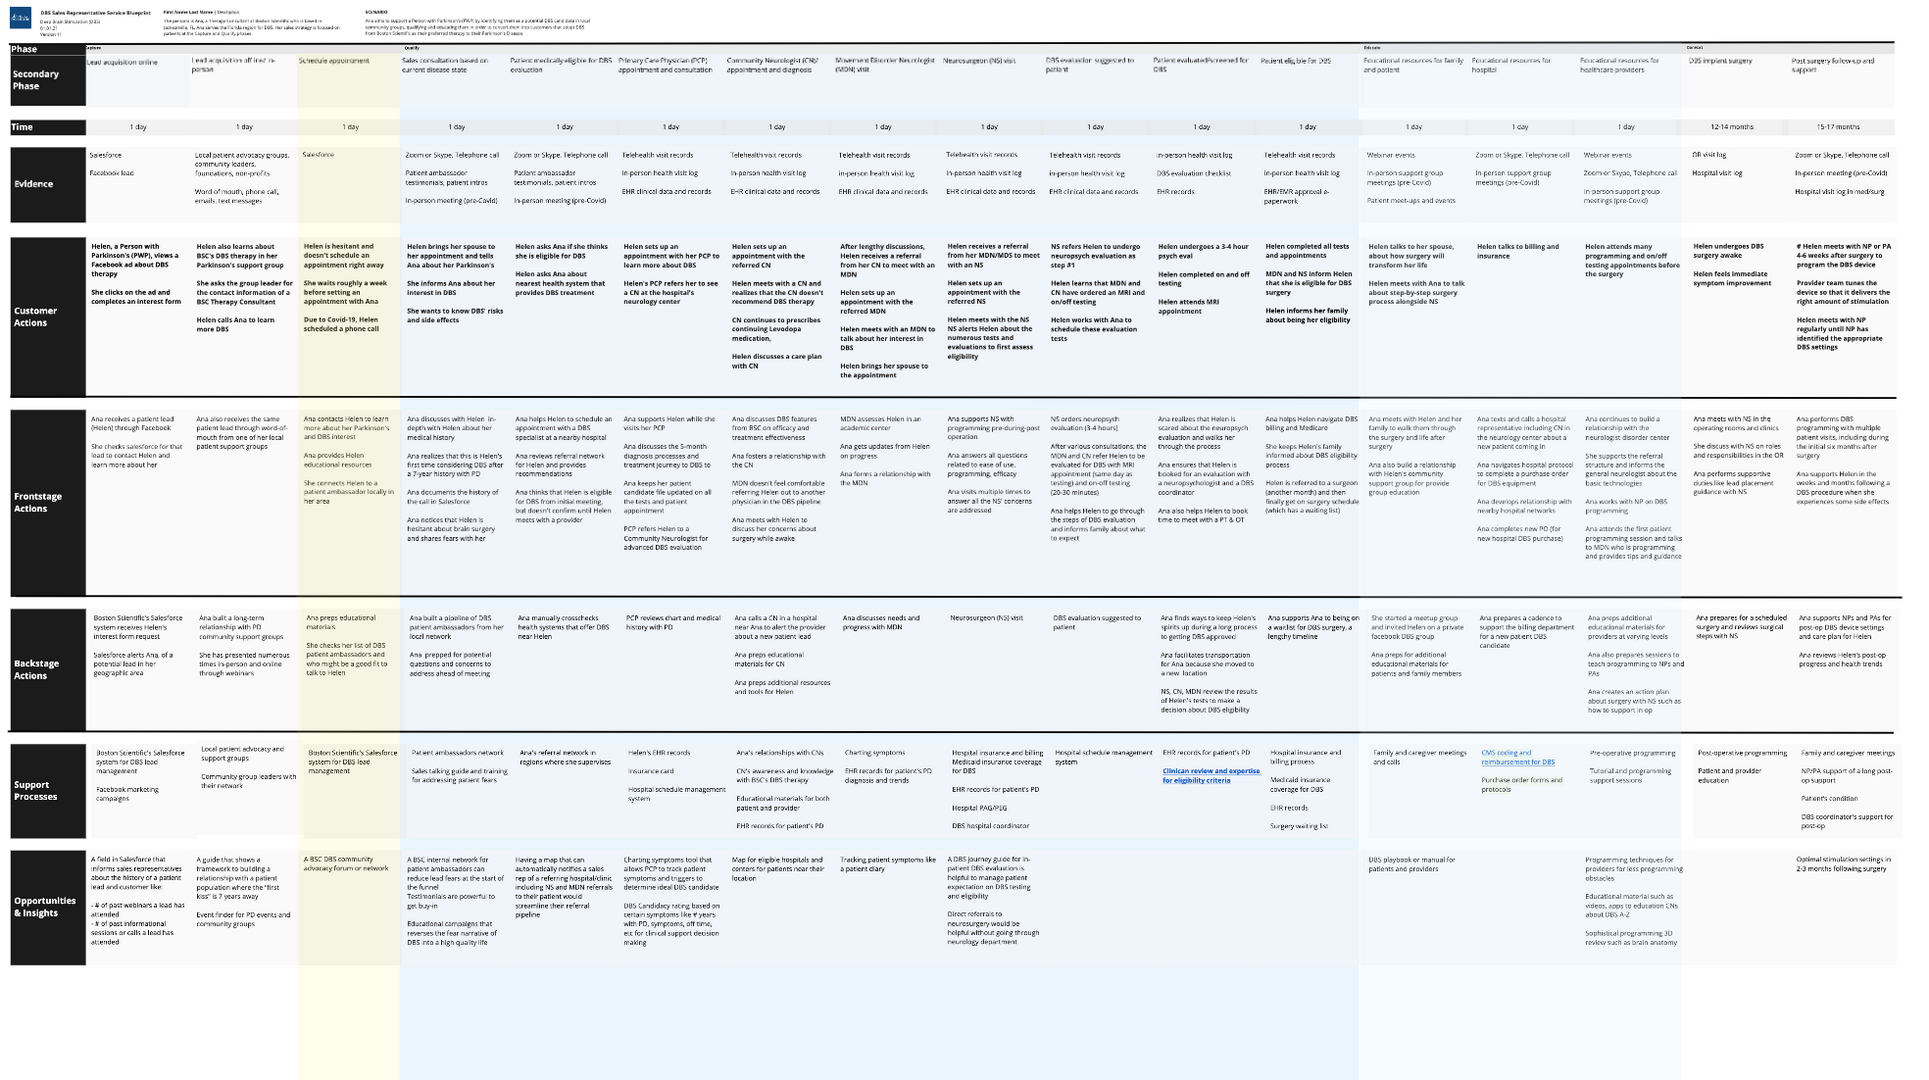 Service Blueprint 2_BSC.png